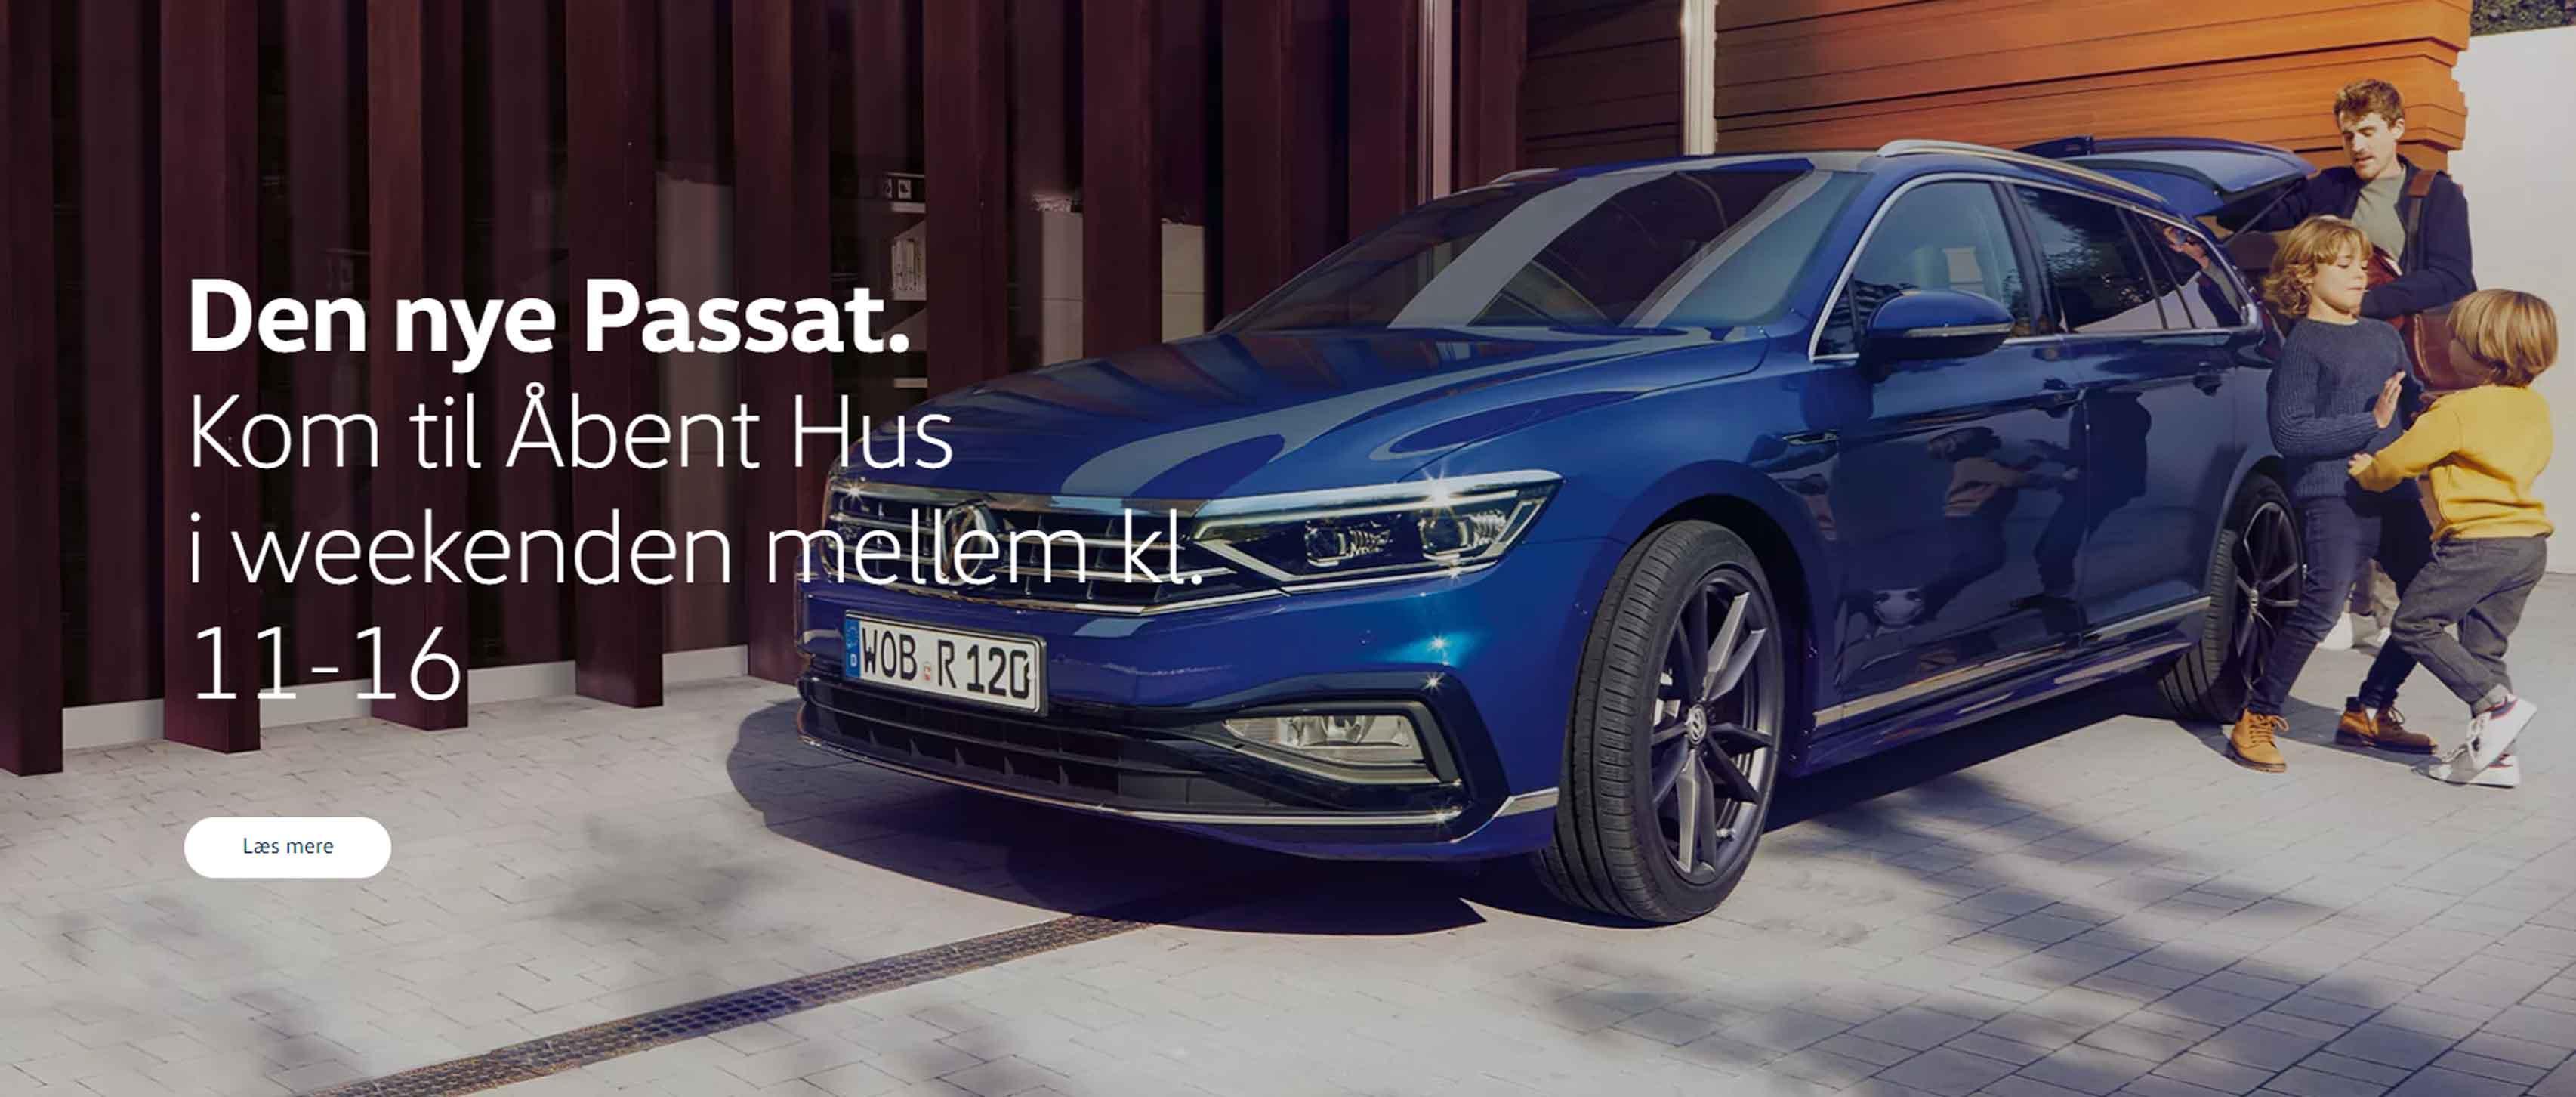 Nytårskur Volkswagen